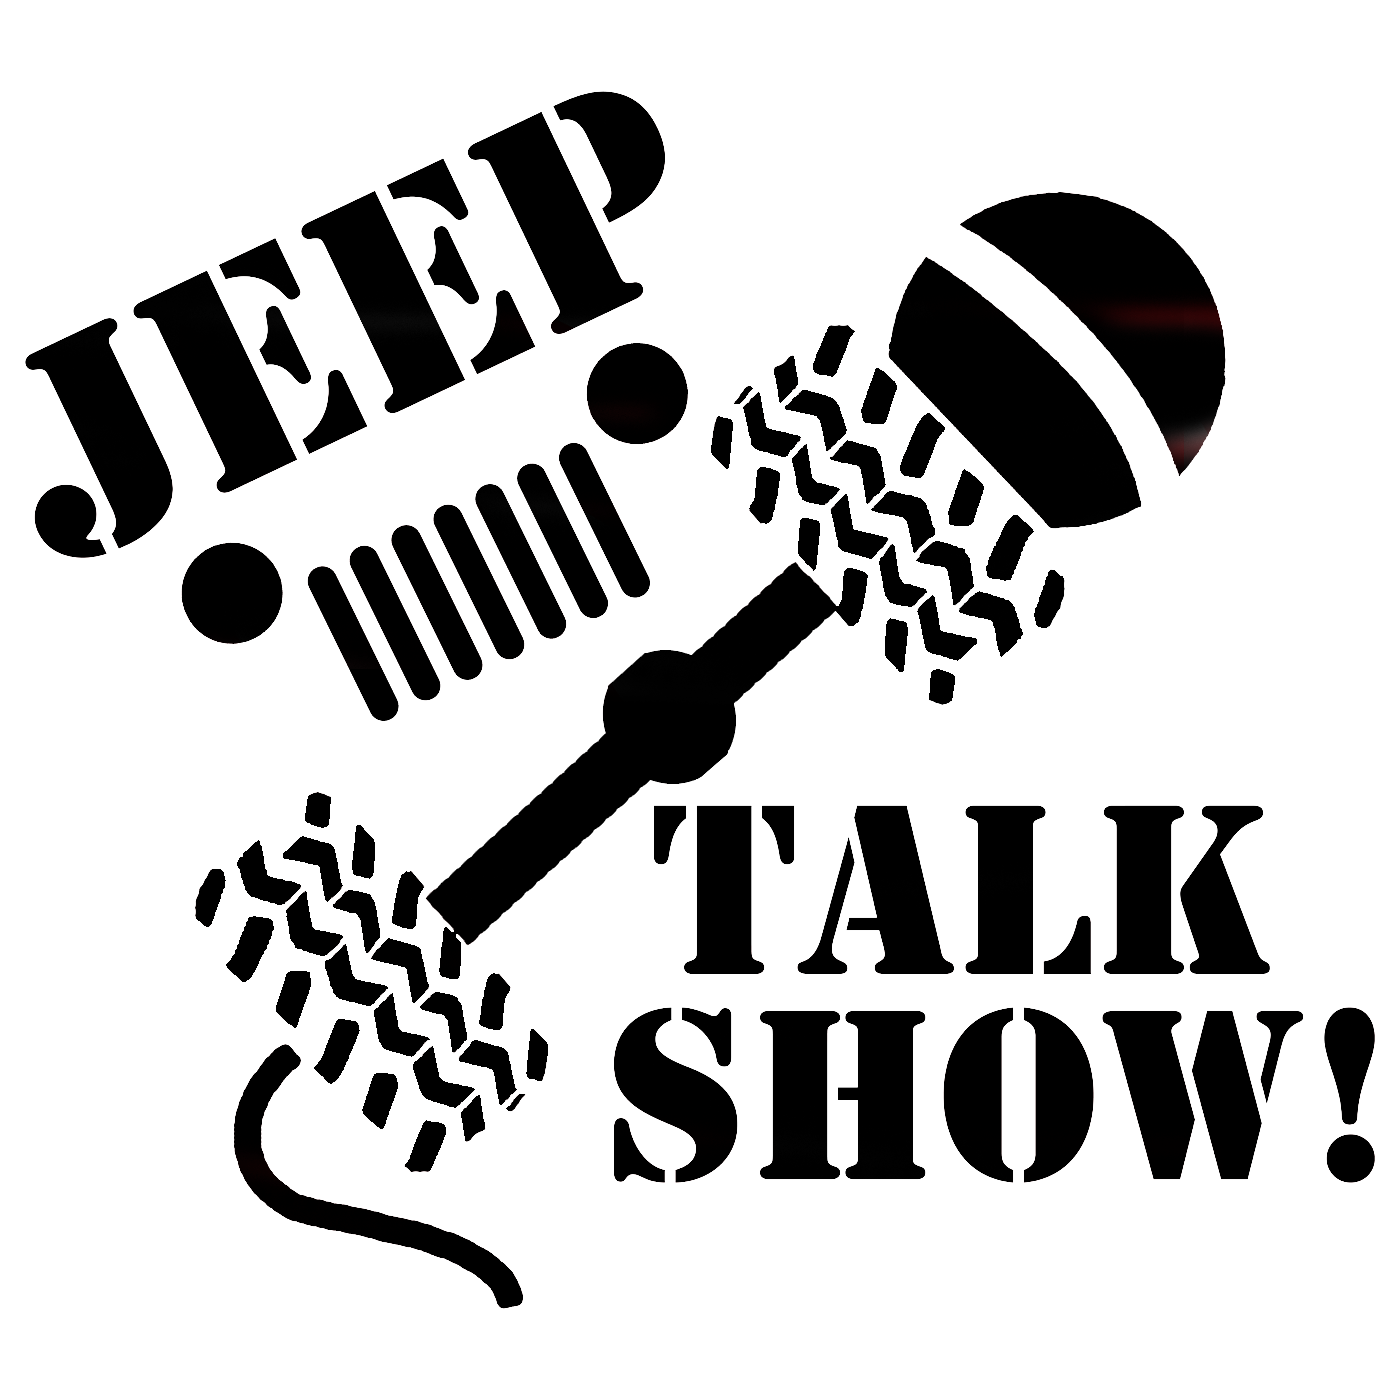 Jeep Talk Show, A Jeep podcast! show art